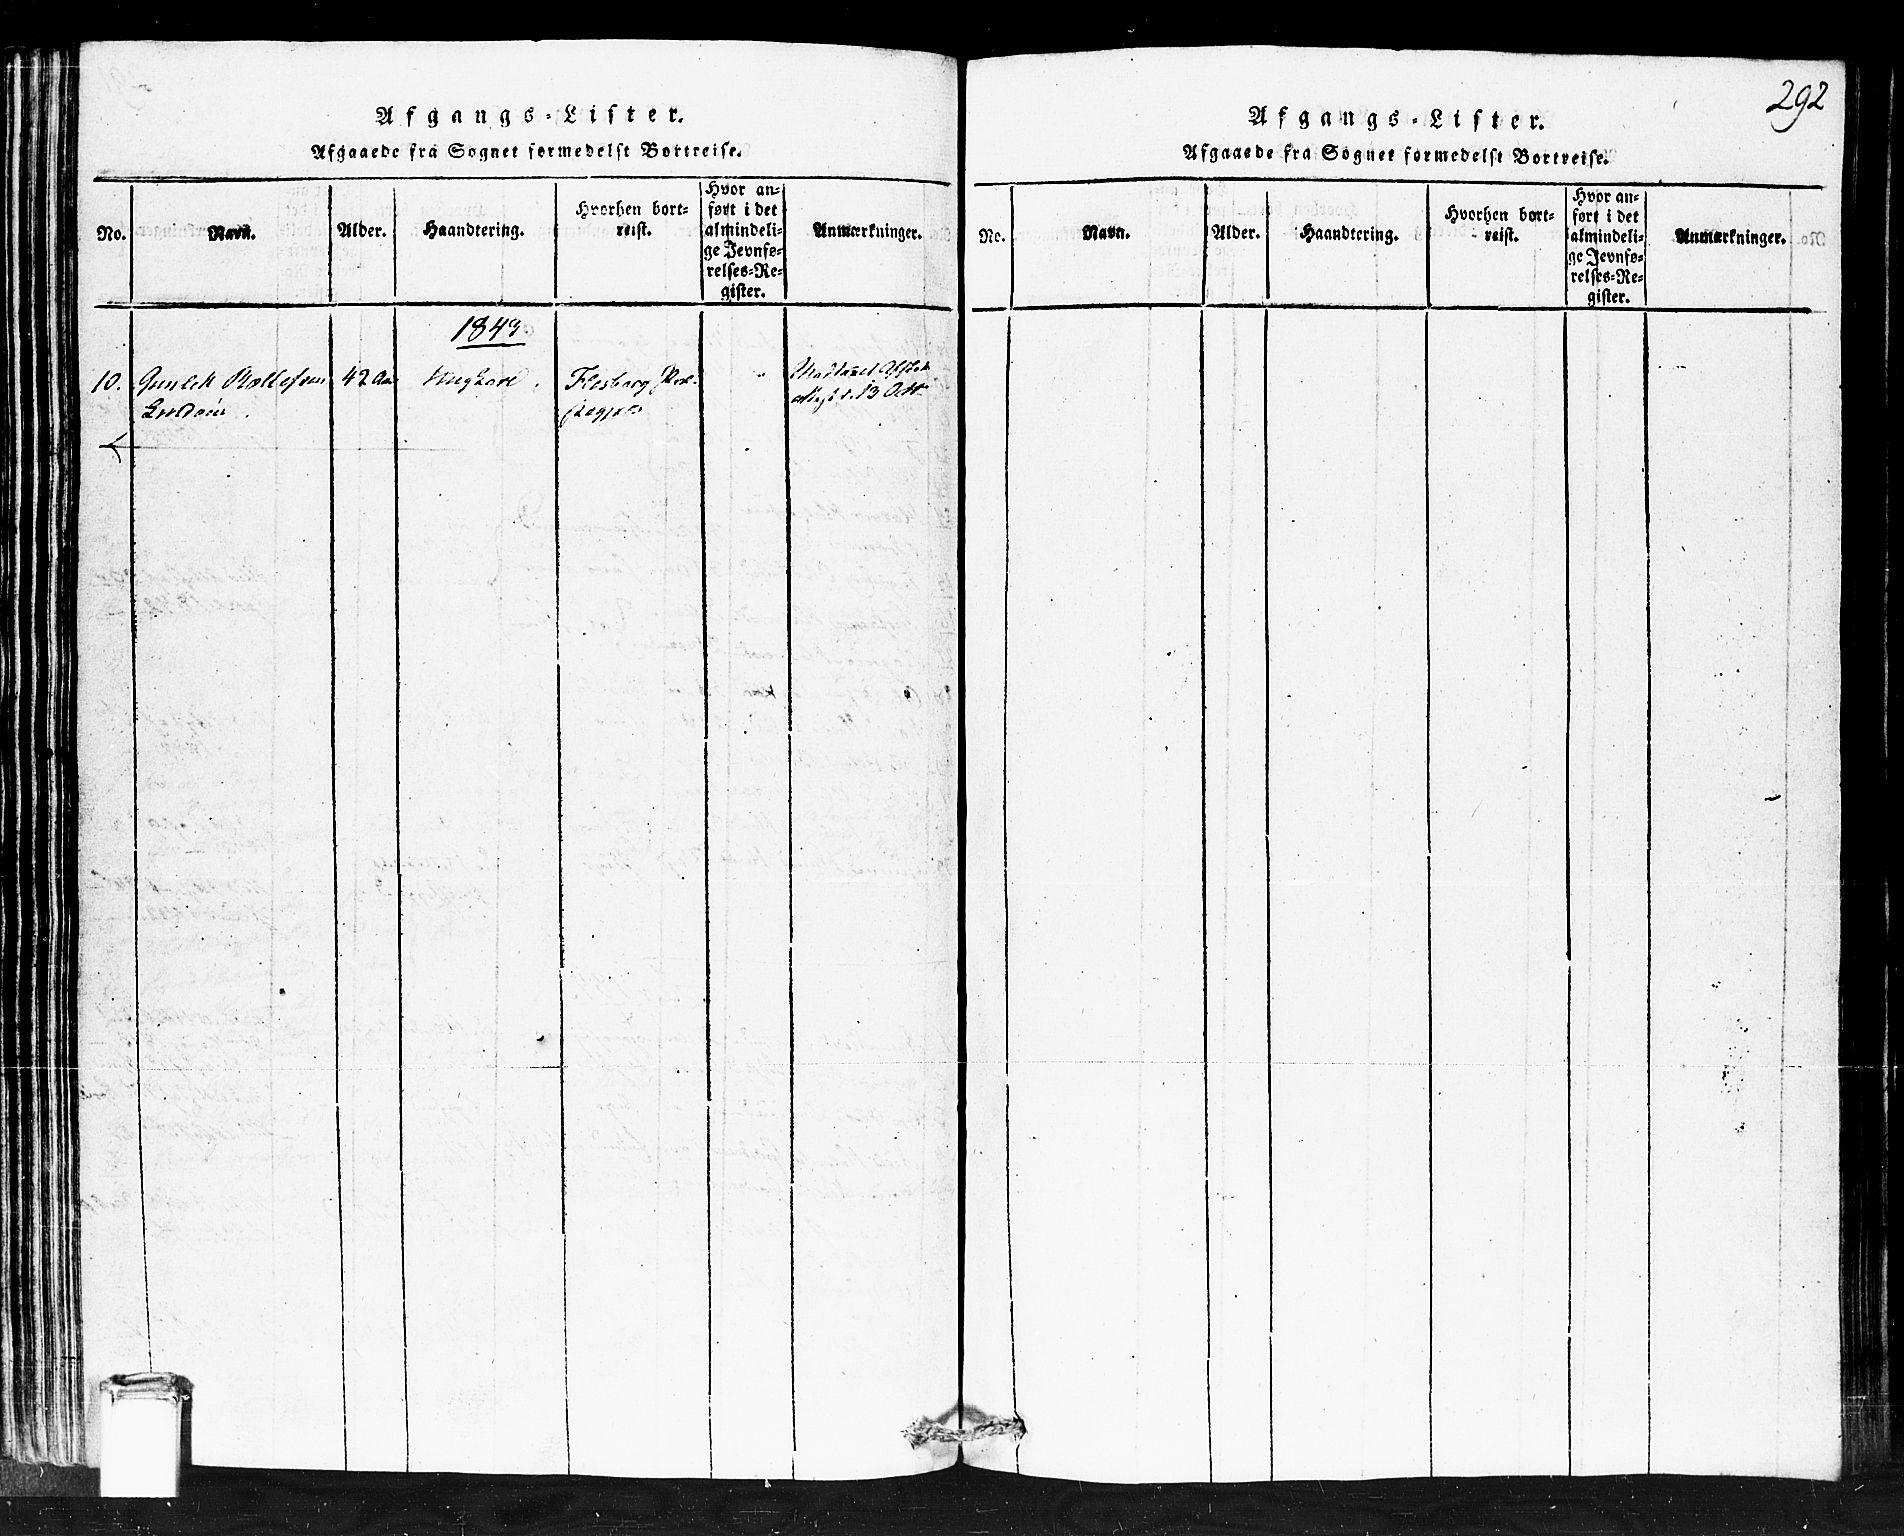 SAKO, Gransherad kirkebøker, F/Fb/L0002: Ministerialbok nr. II 2, 1815-1843, s. 292